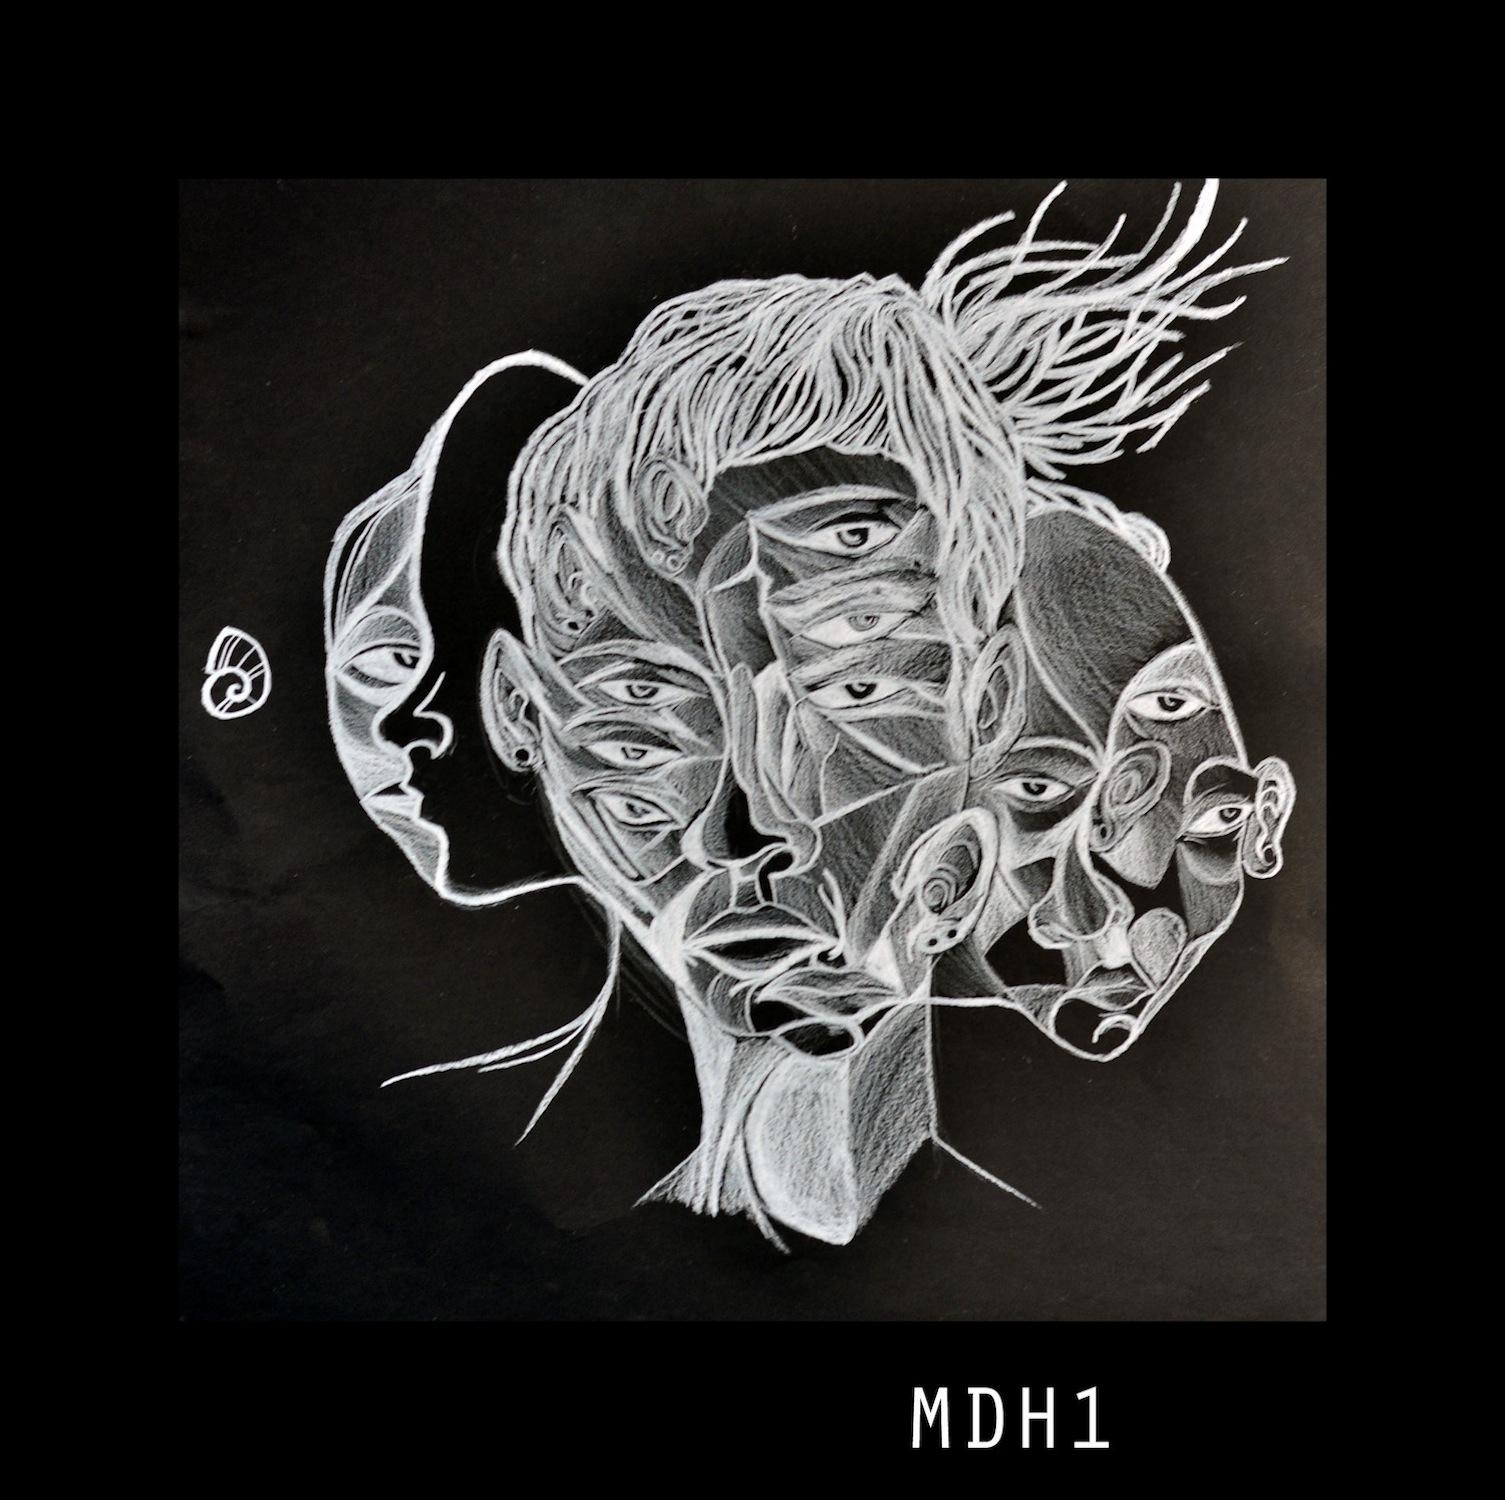 12-MDH1.JPG